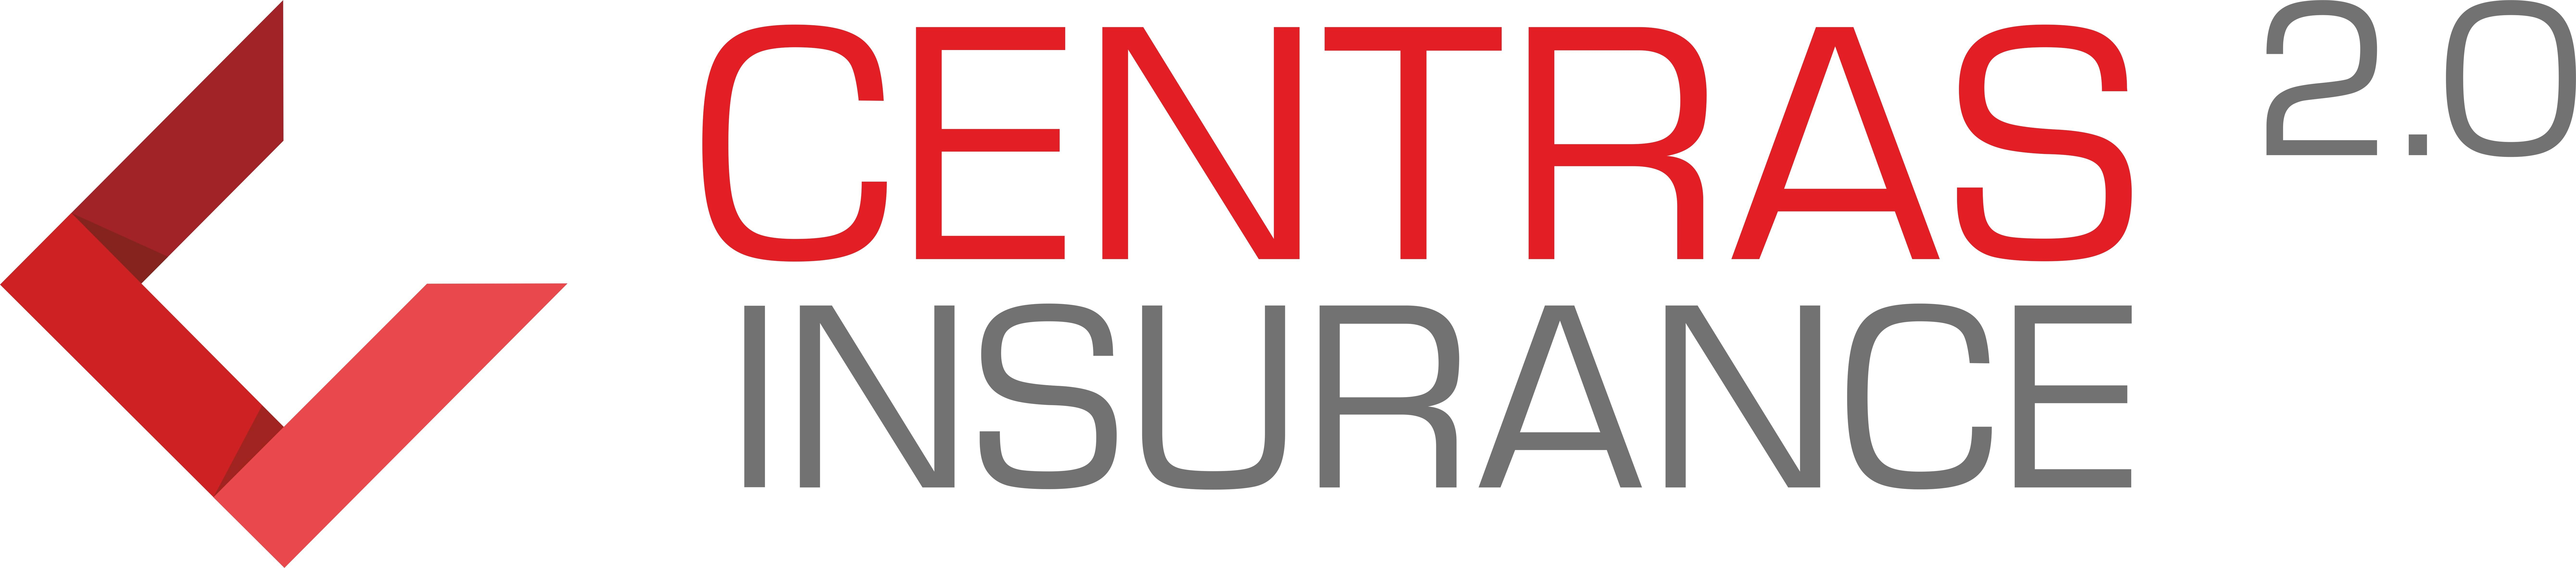 Centras Insurance